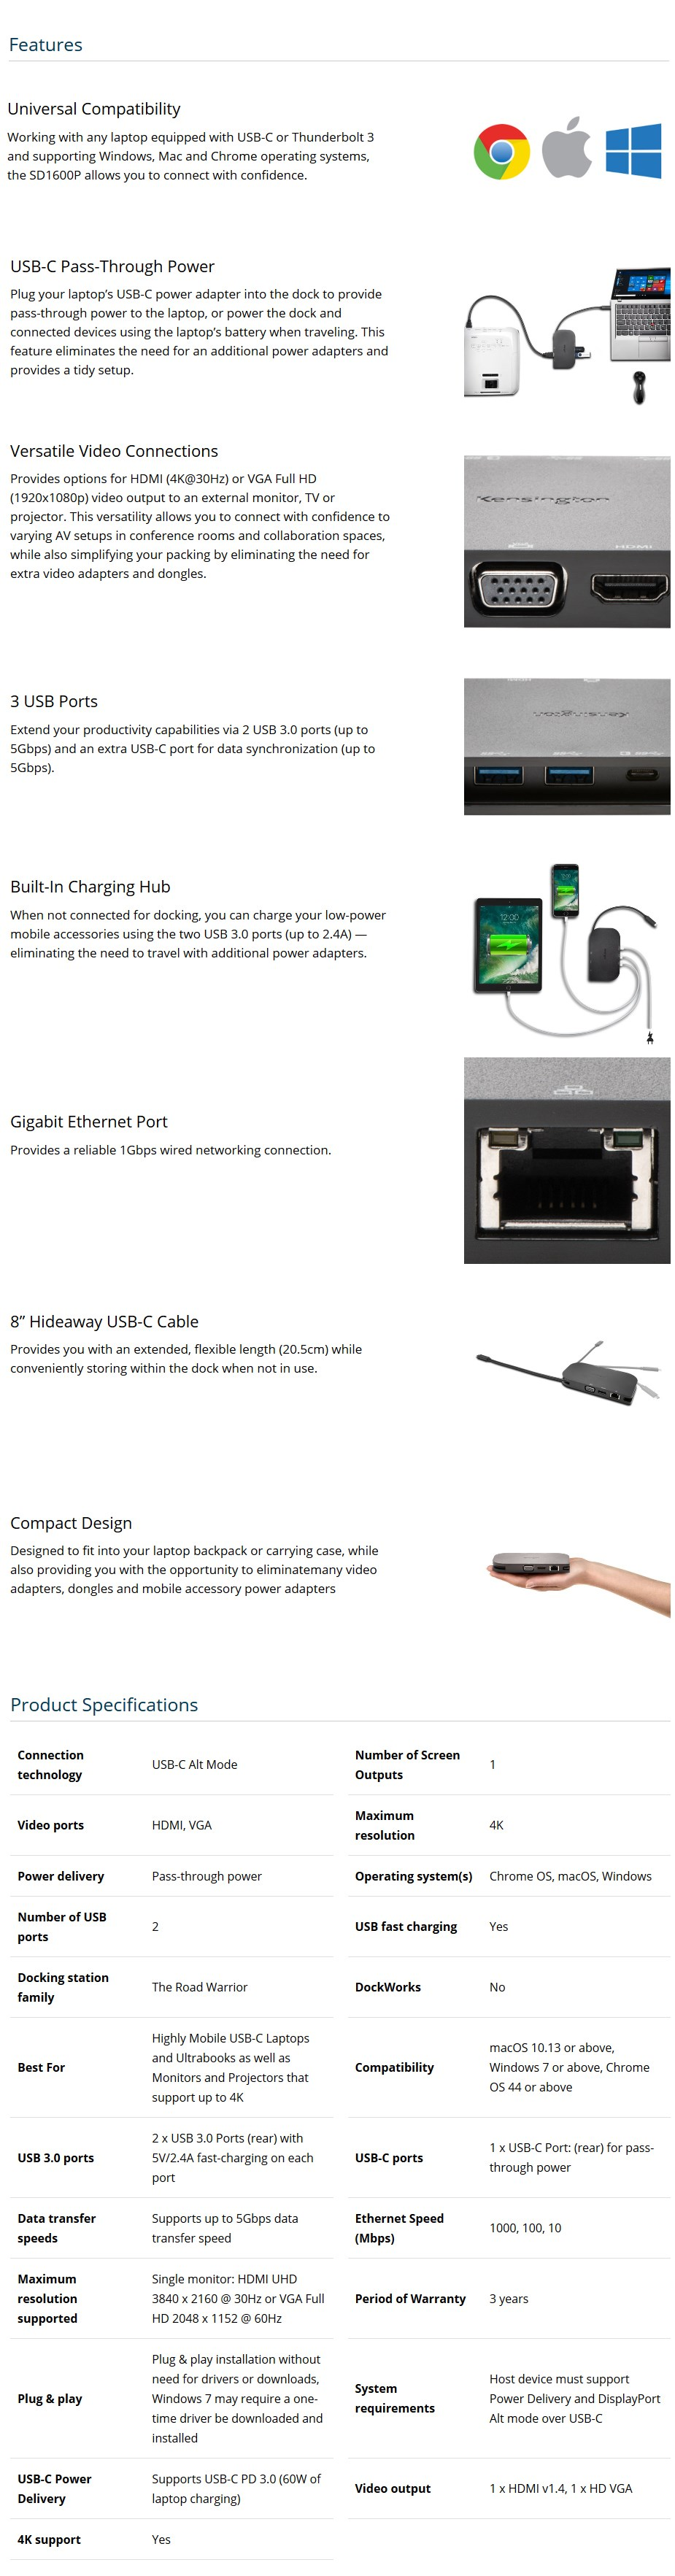 Kensington SD1600P USB Type-C Mobile Docking Station - Desktop Overview 1